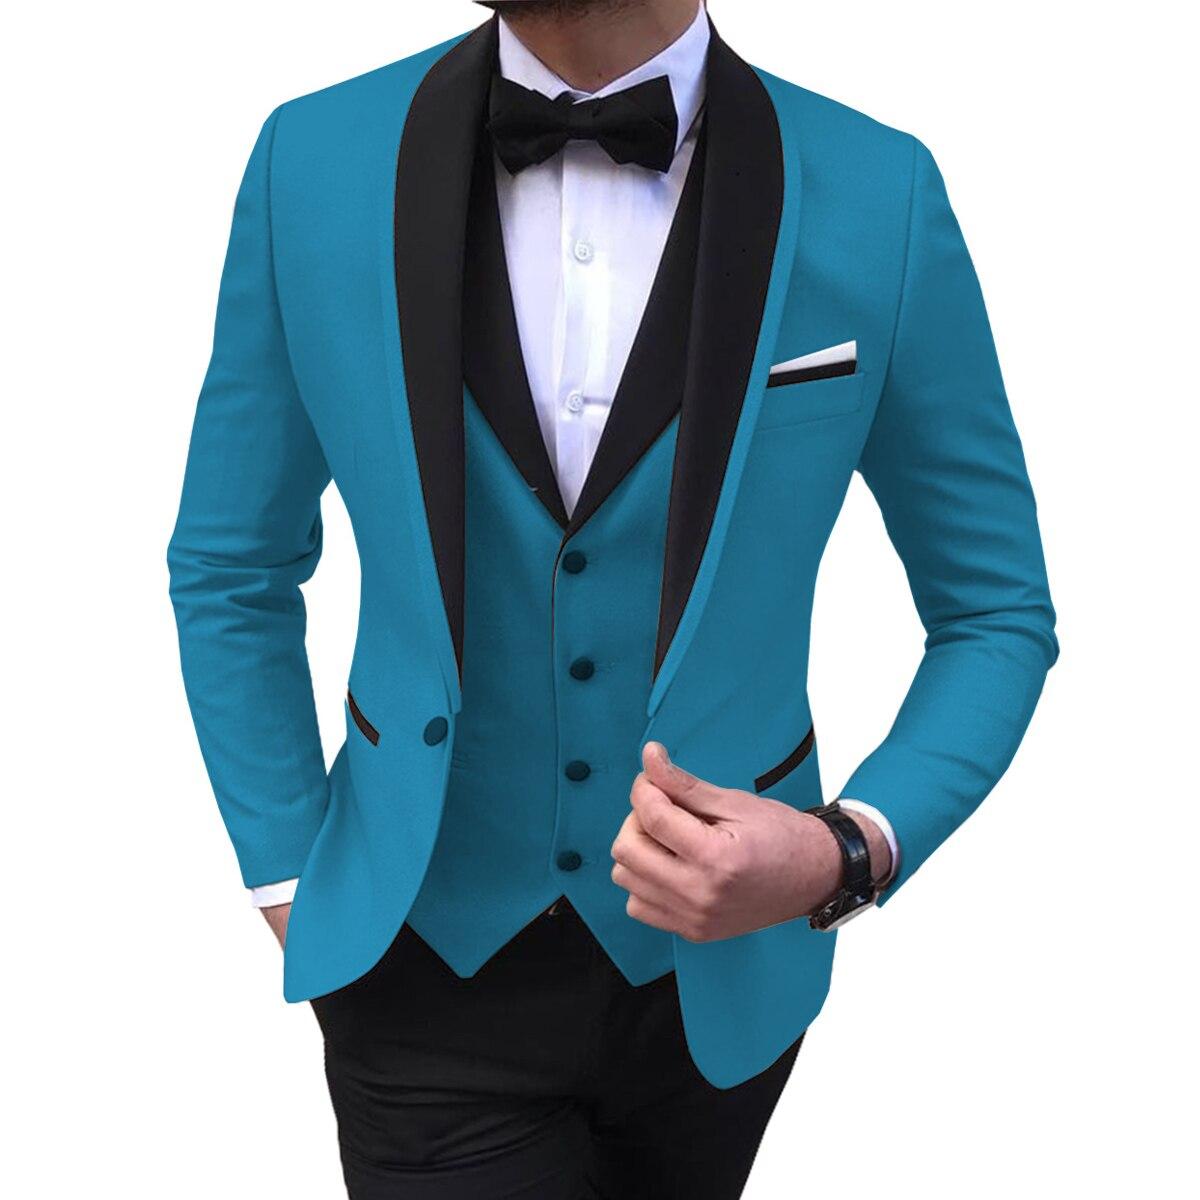 Shinny Teal Slit Mens Suits 3 Piece Black Shawl Lapel Casual Tuxedos For Wedding Groomsmen Suits Men 2020 (Blazer+Vest+Pant)